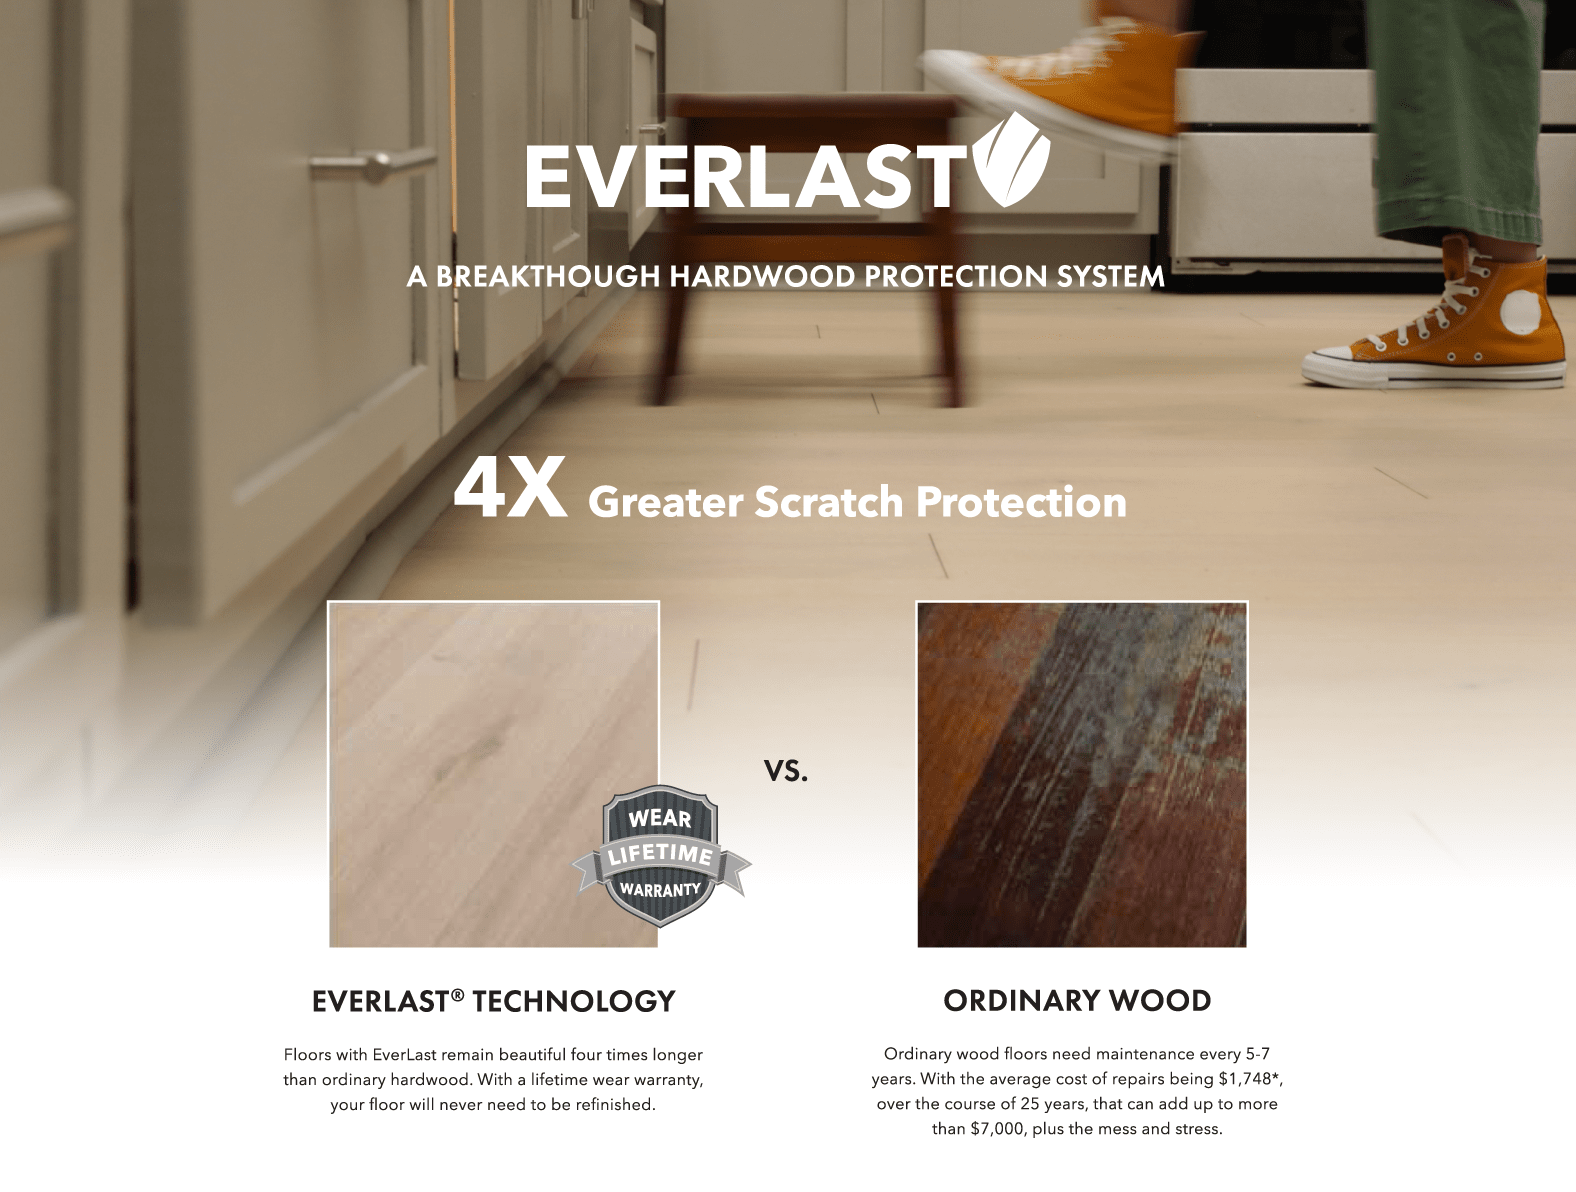 ultrawood-everlast-1-novid